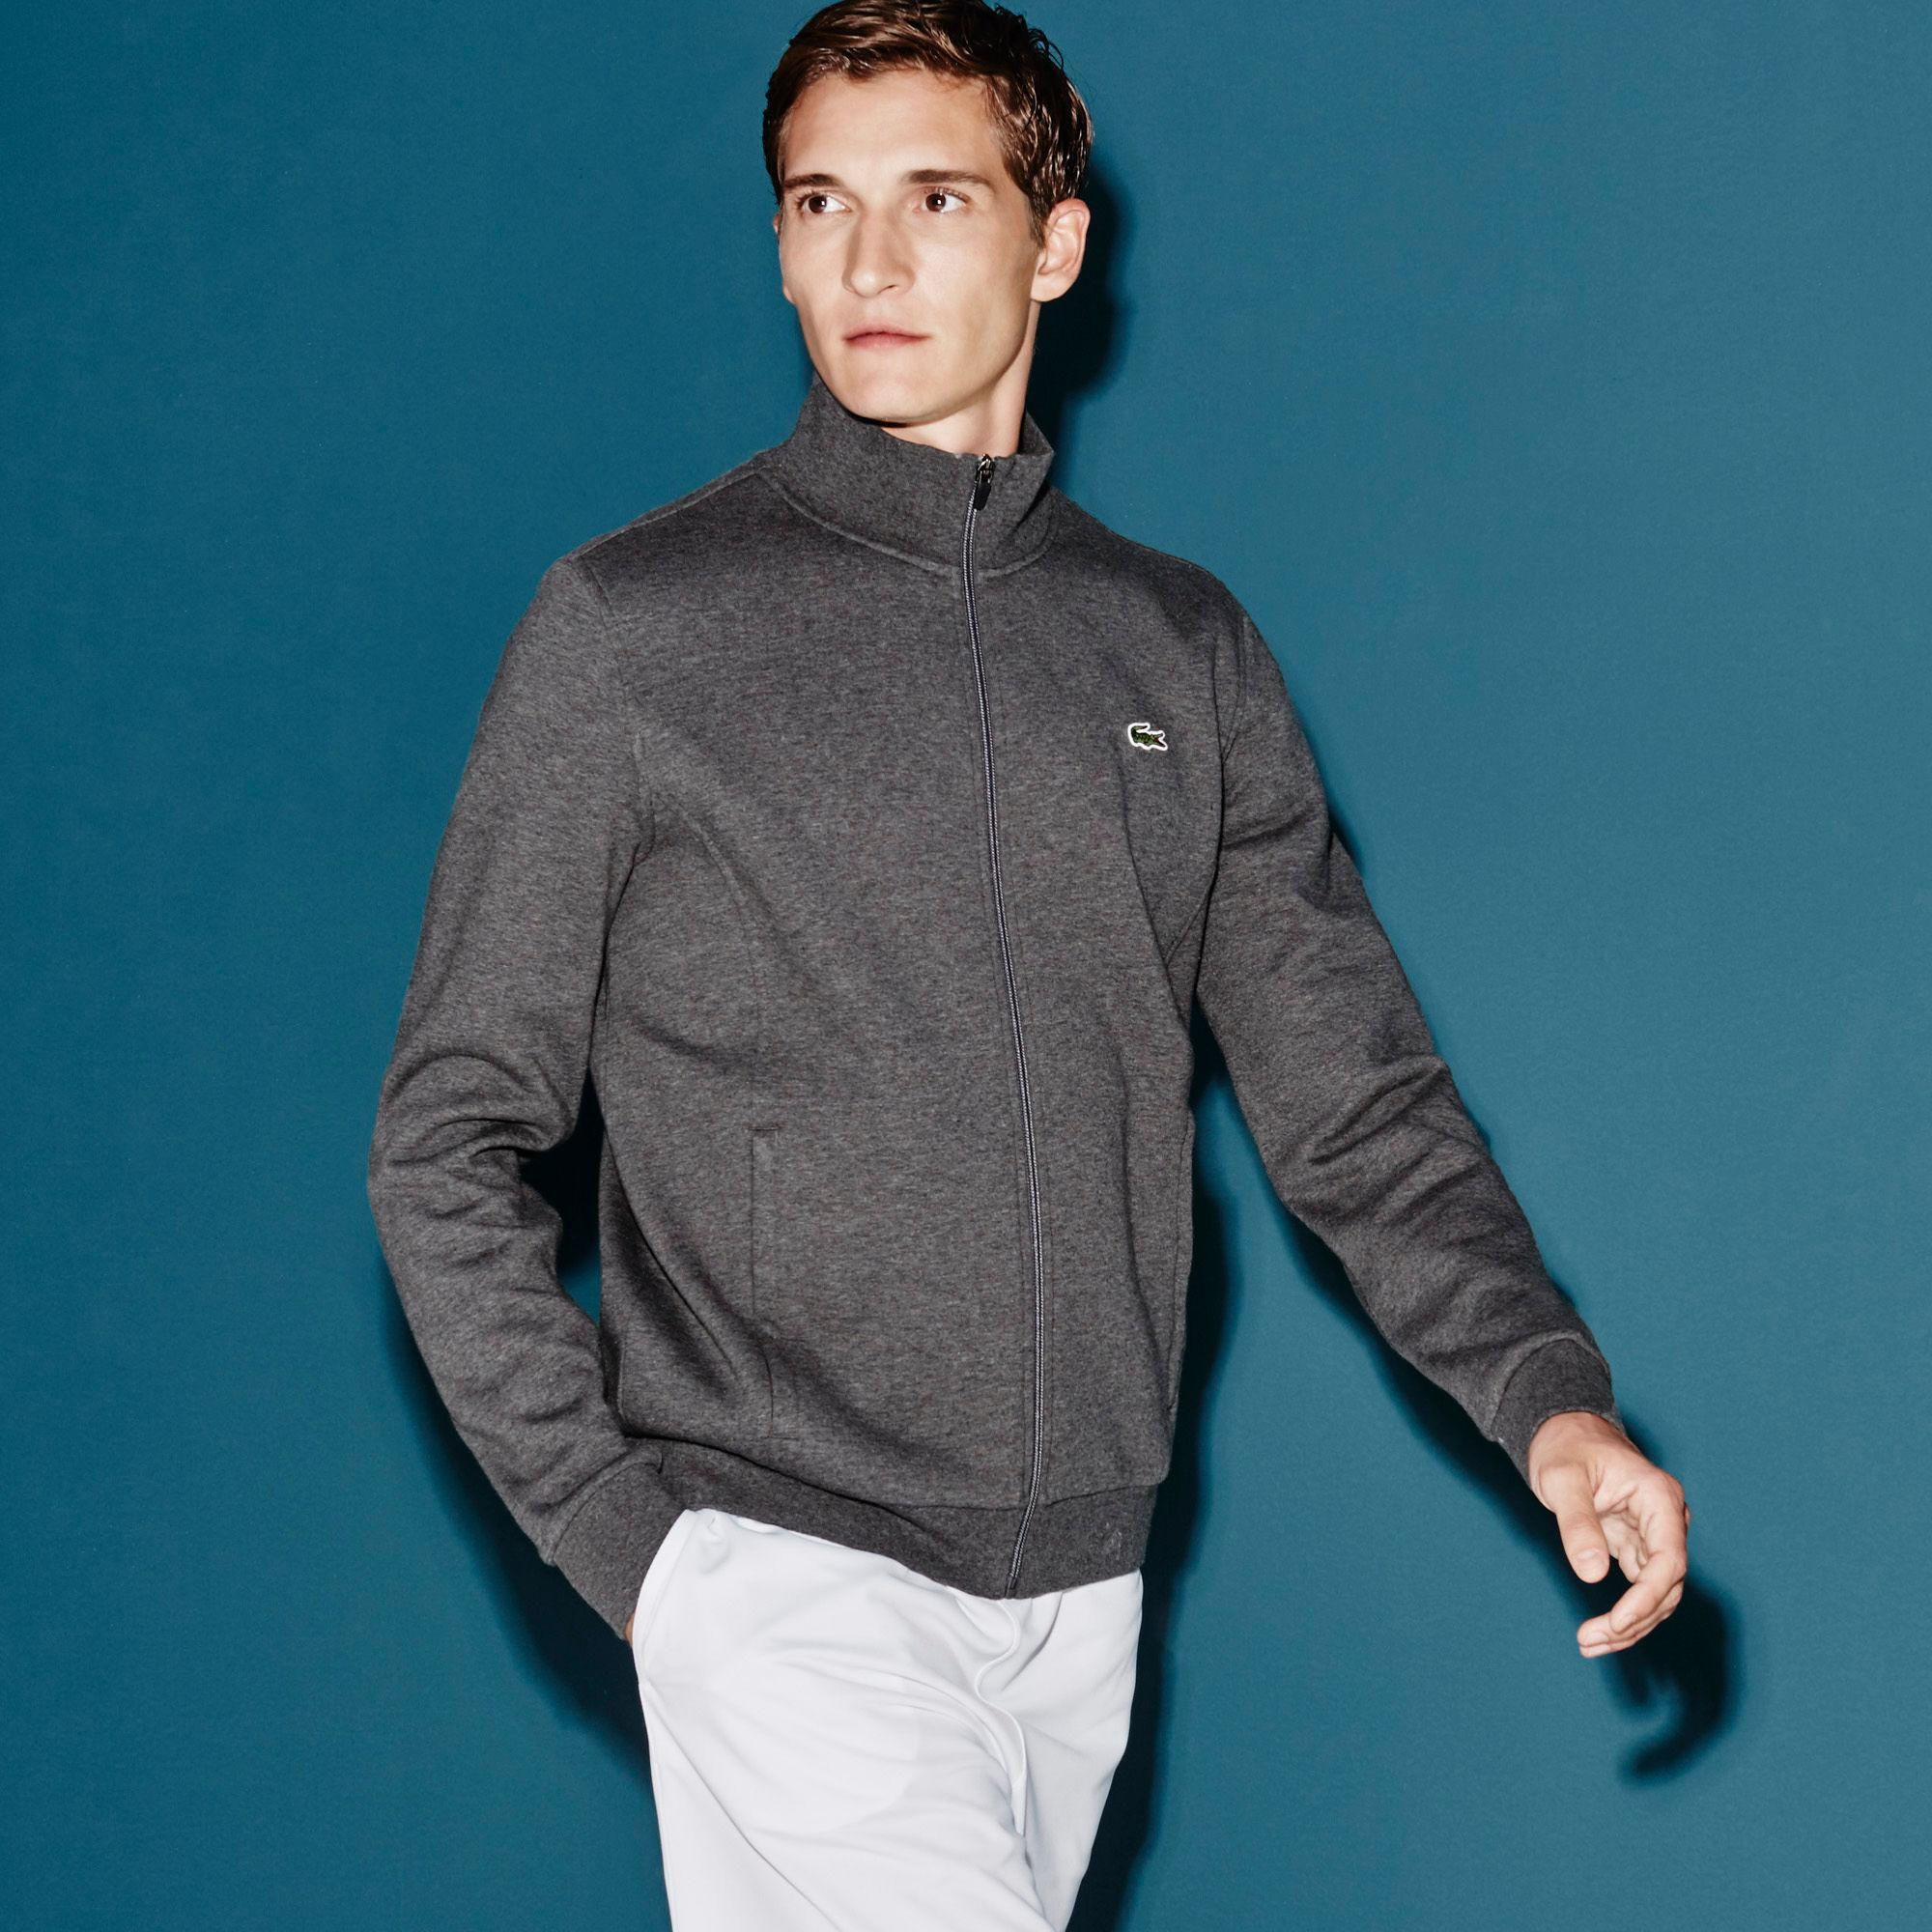 cfbfc92350f6 Lacoste Sport Mens Zippered Fleece Sweatshirt - Pitch Grey ...